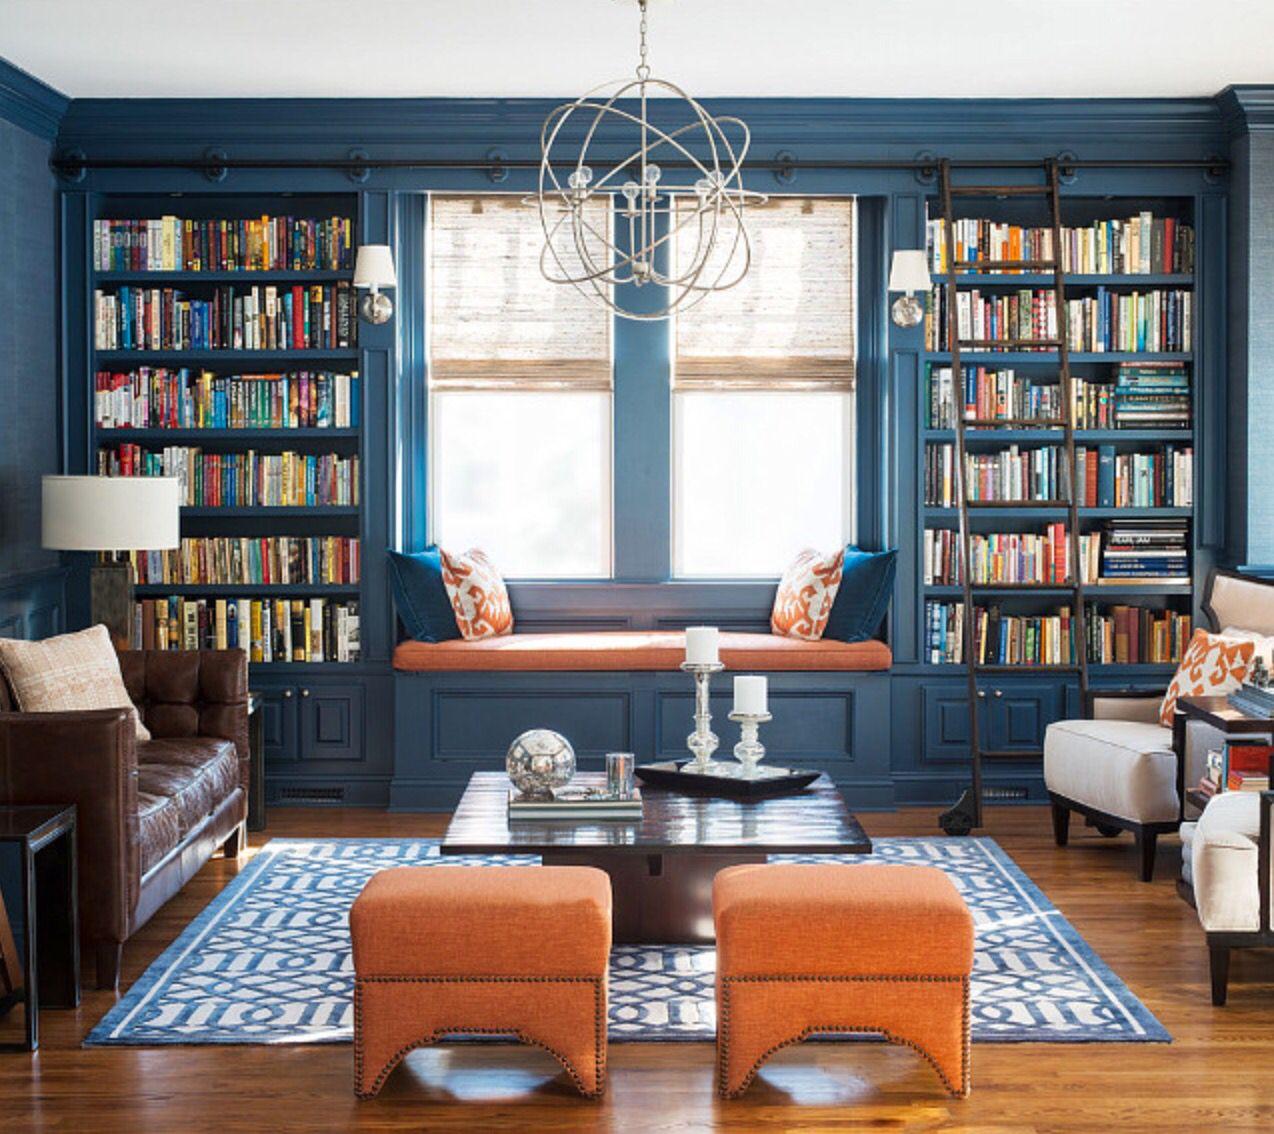 Benjamin moore newberryport blue dreamy living rooms et al